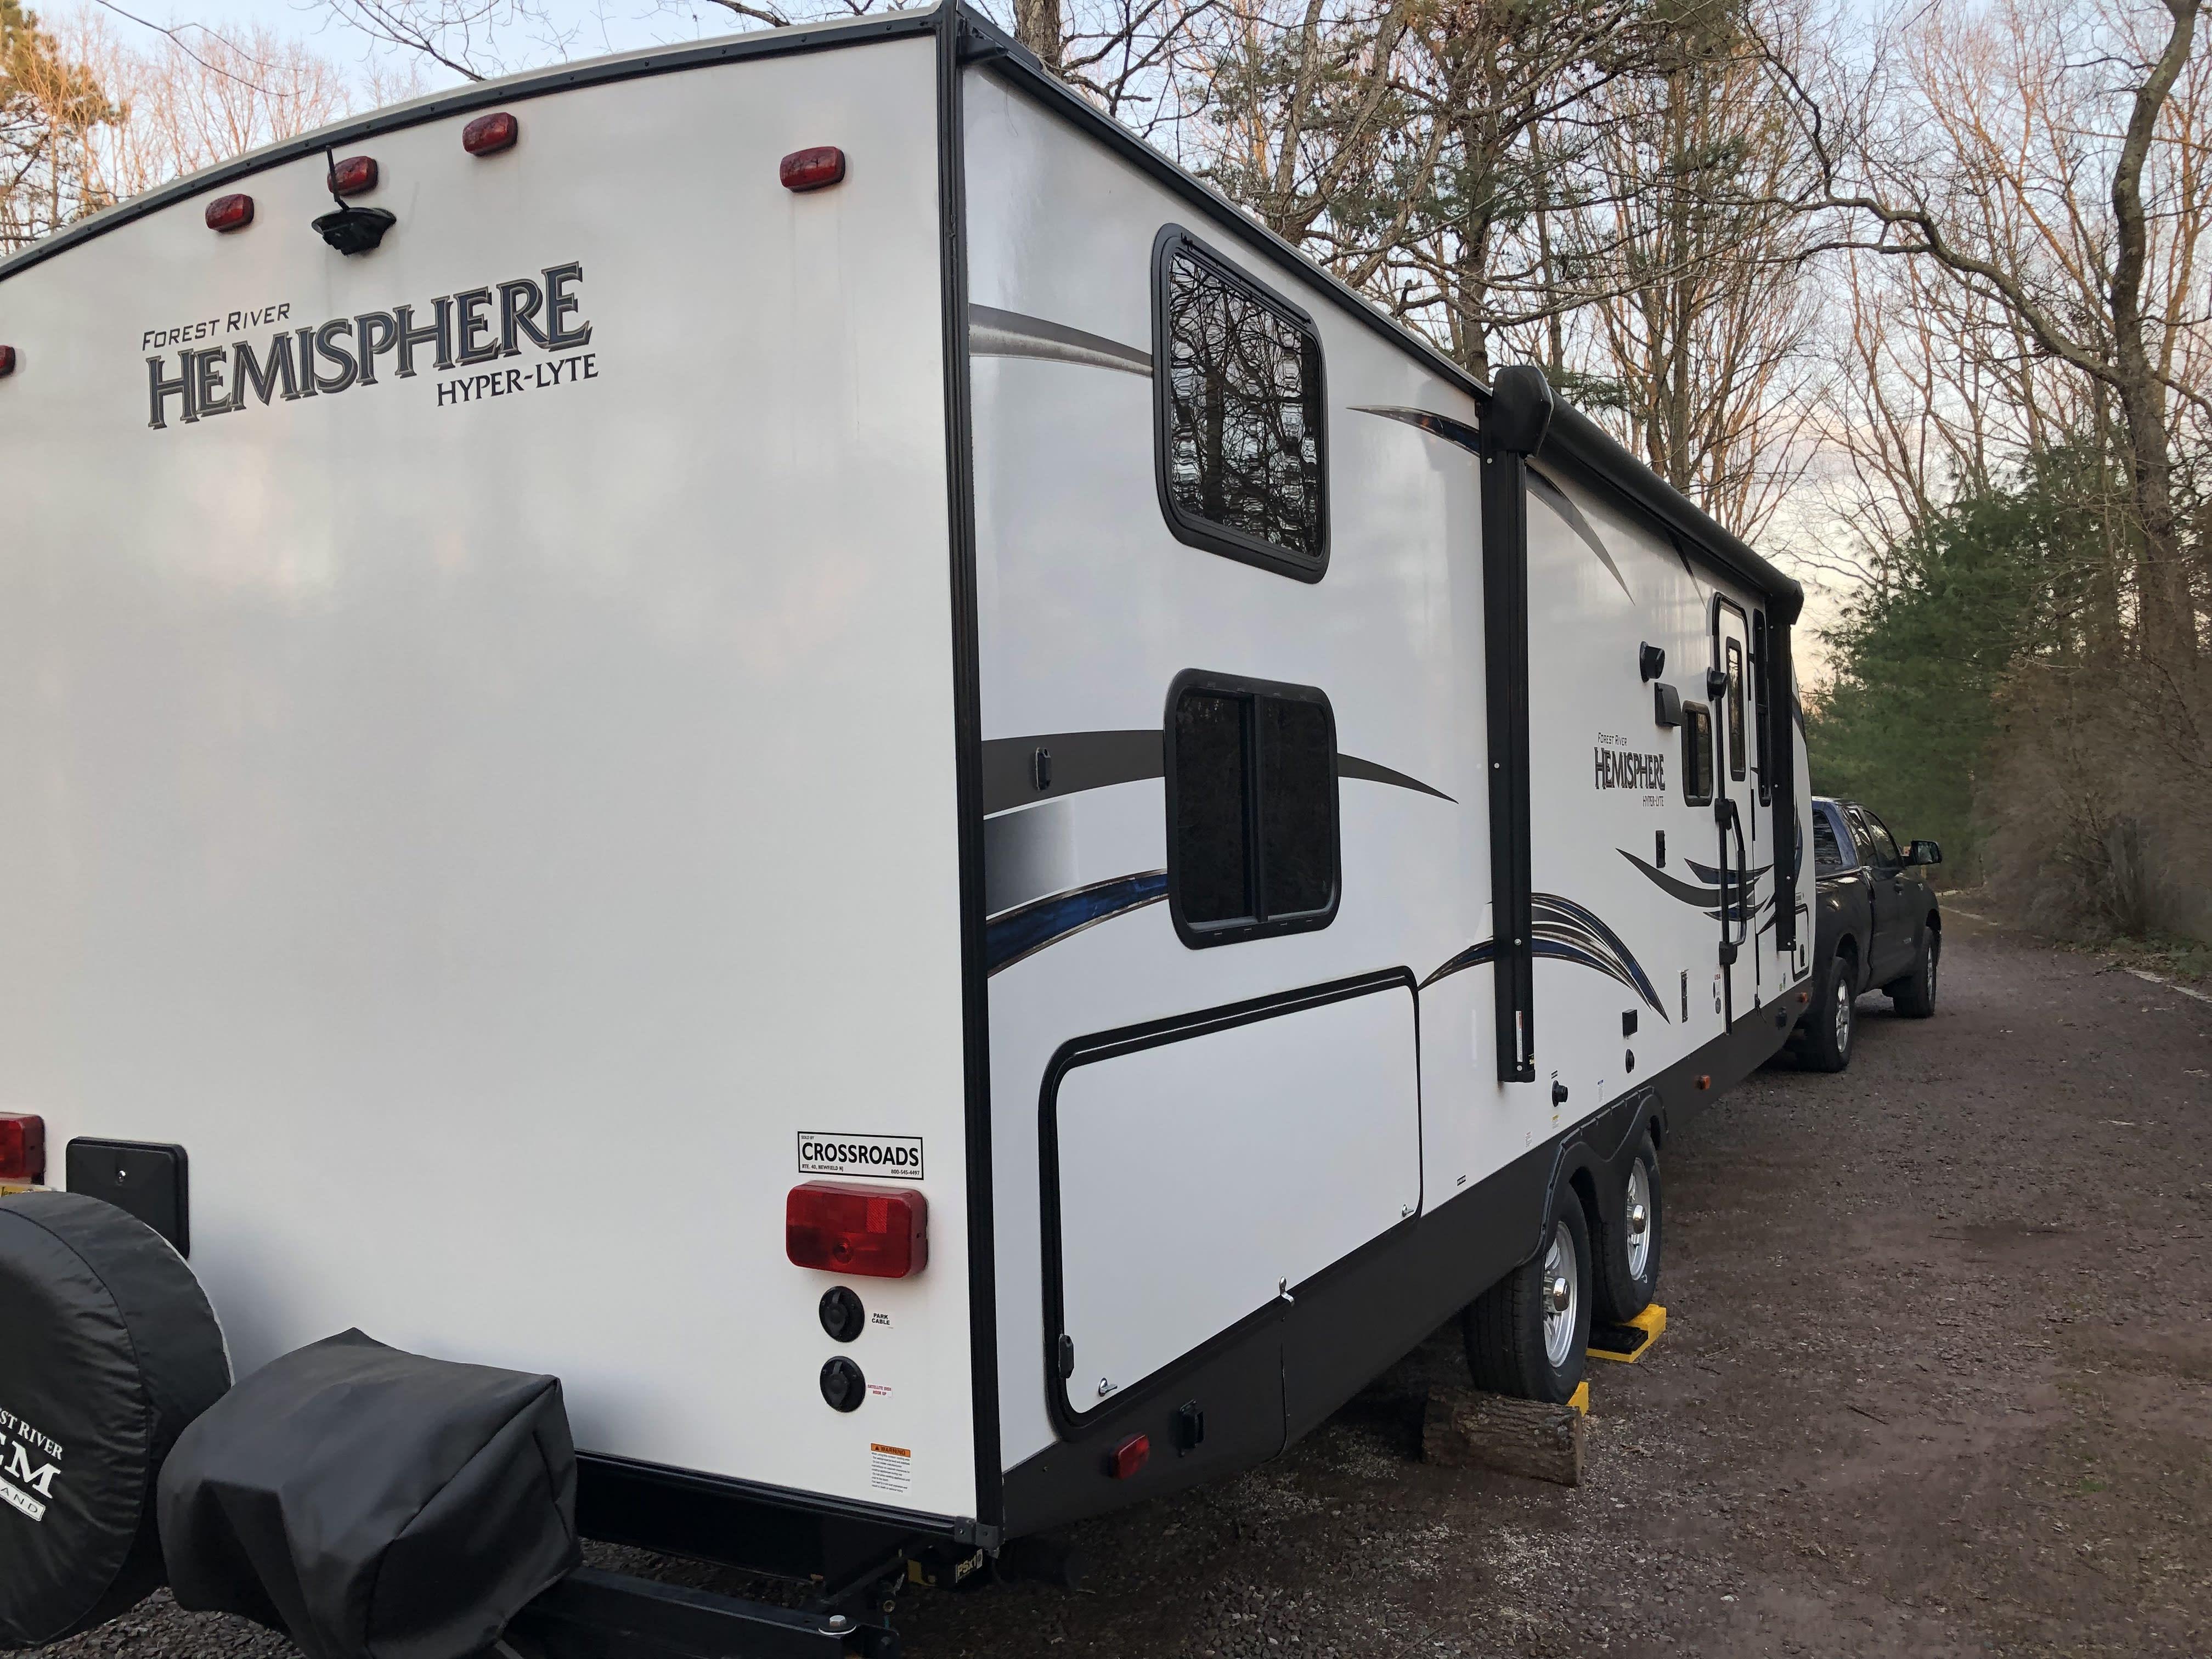 Forest River Hemisphere Hyper-Lite 29BHHL 2019